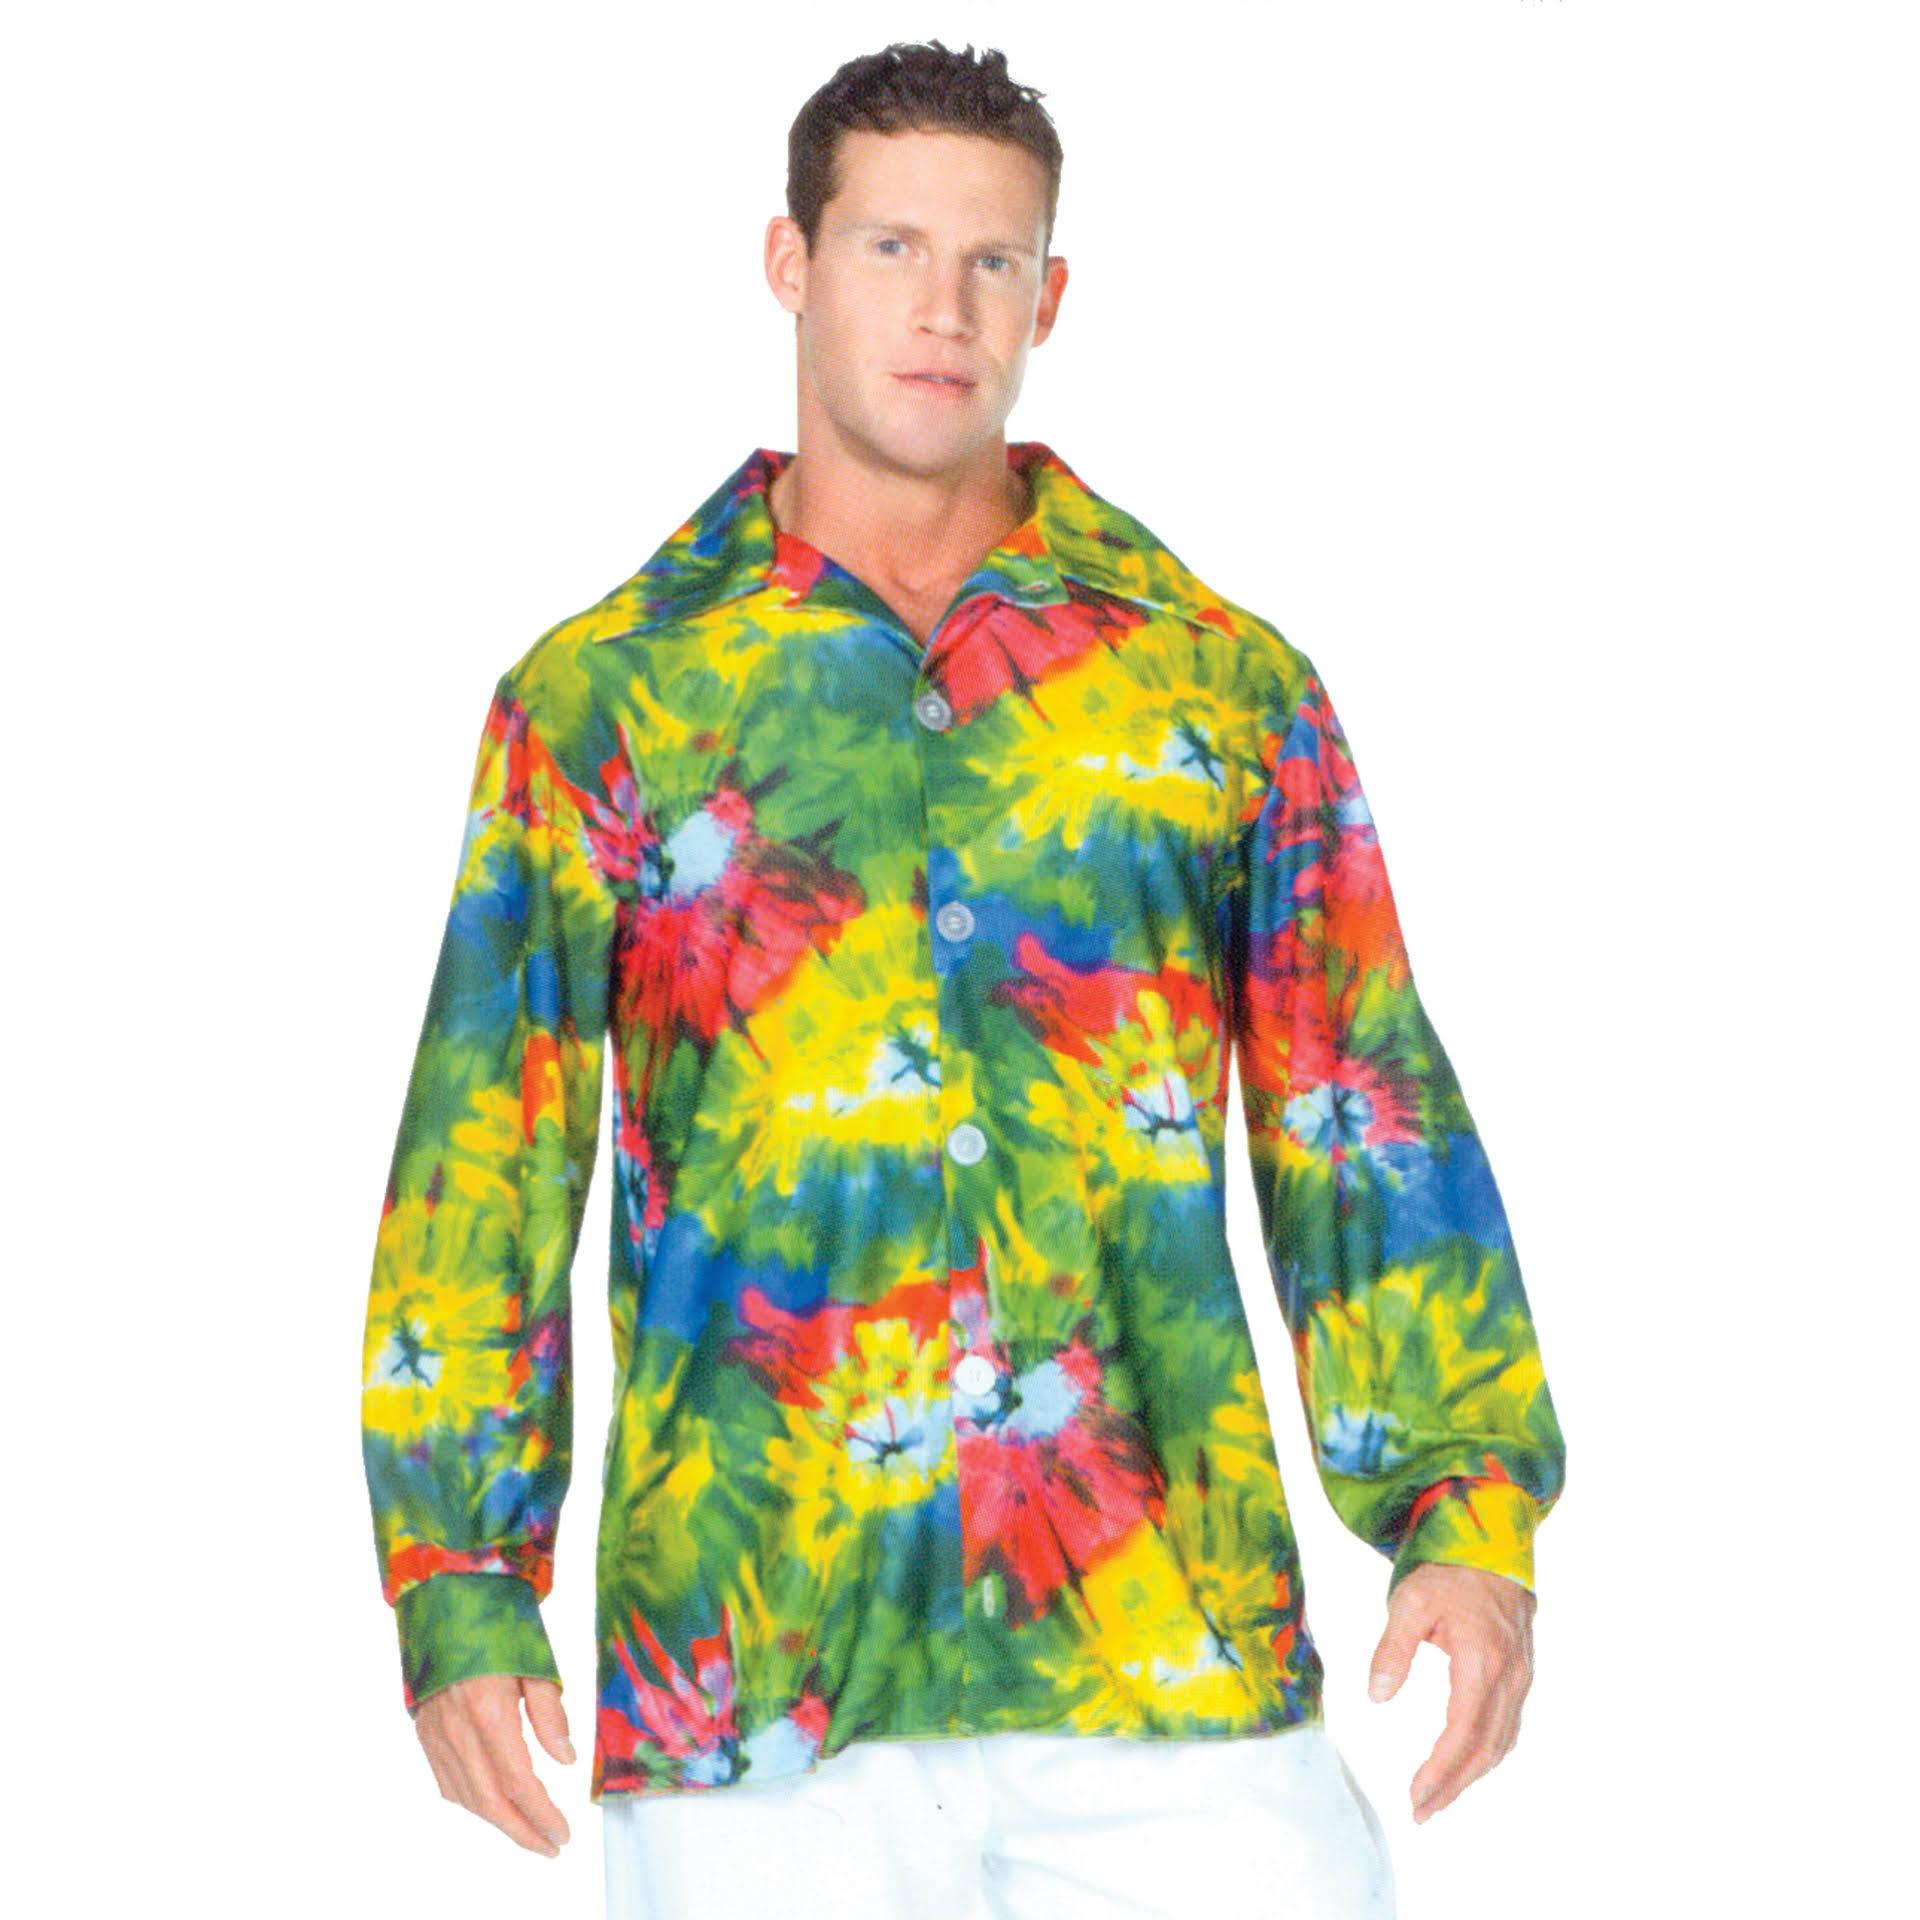 Jahre Shirt Adult 60er Dye Costumes Morris One Sz Tie xPCgqpEw